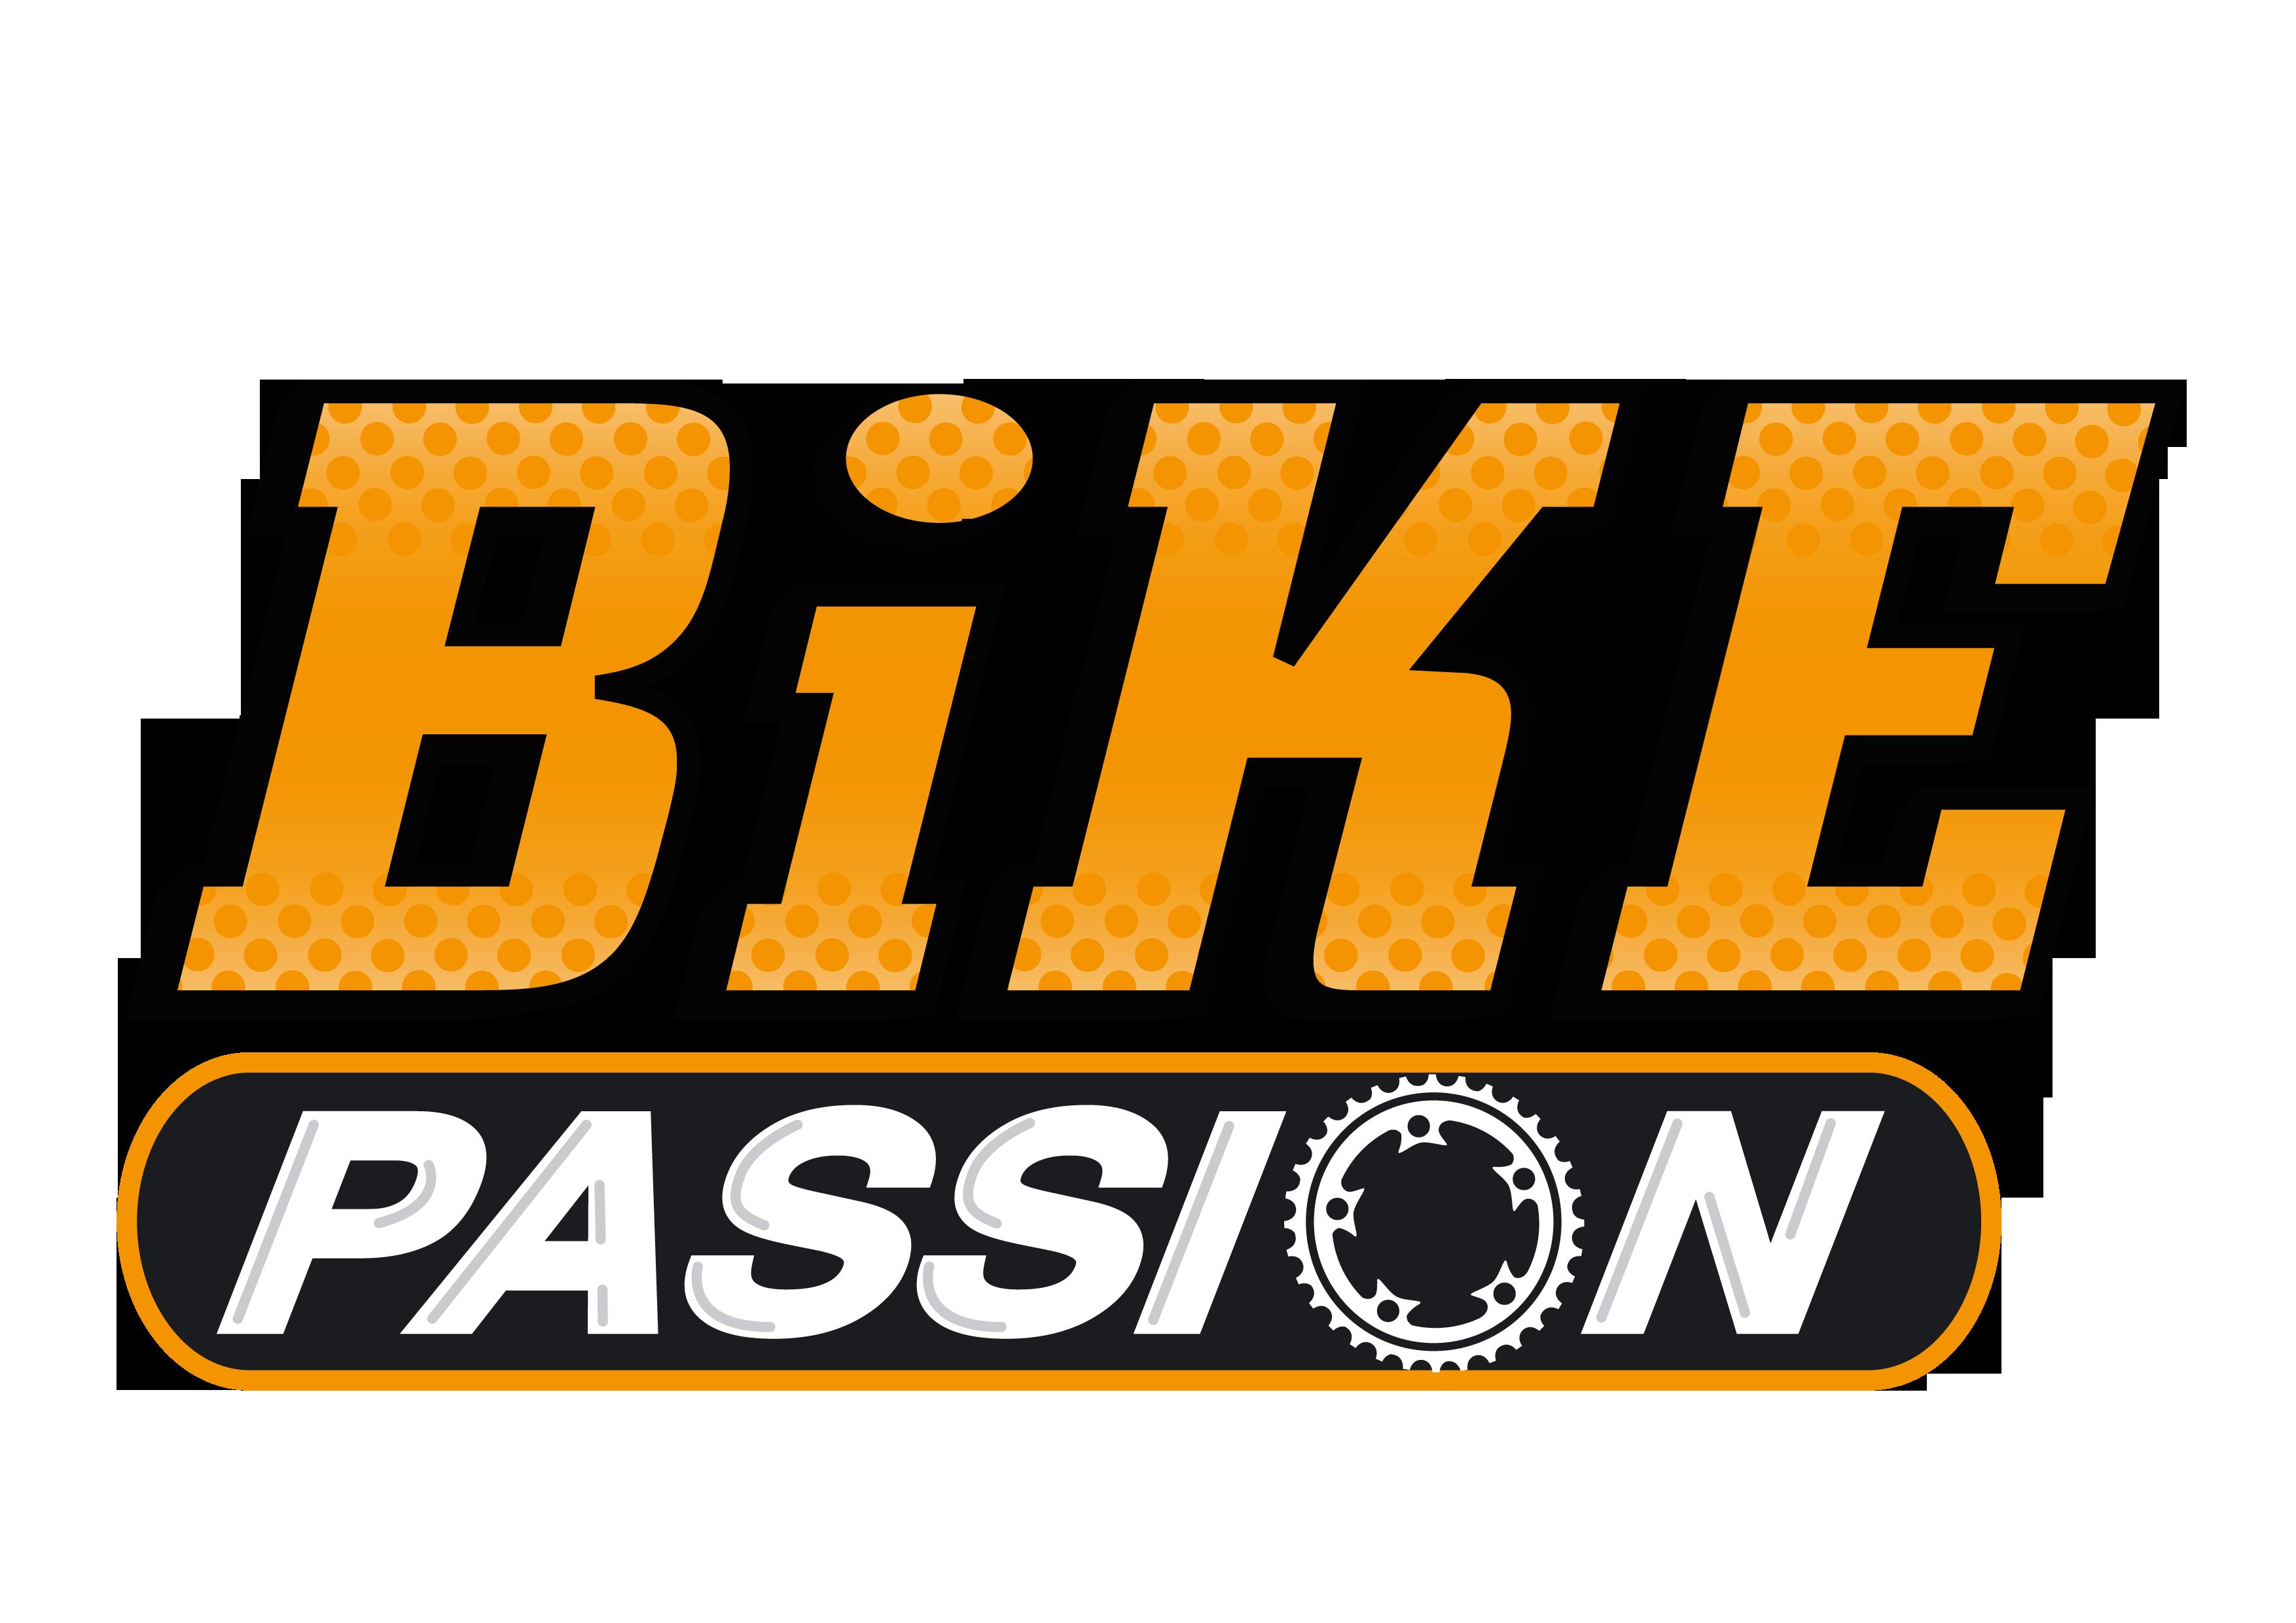 https://www.fondationbrunoboscardin.ch/wp-content/uploads/2018/04/bike-passion.png